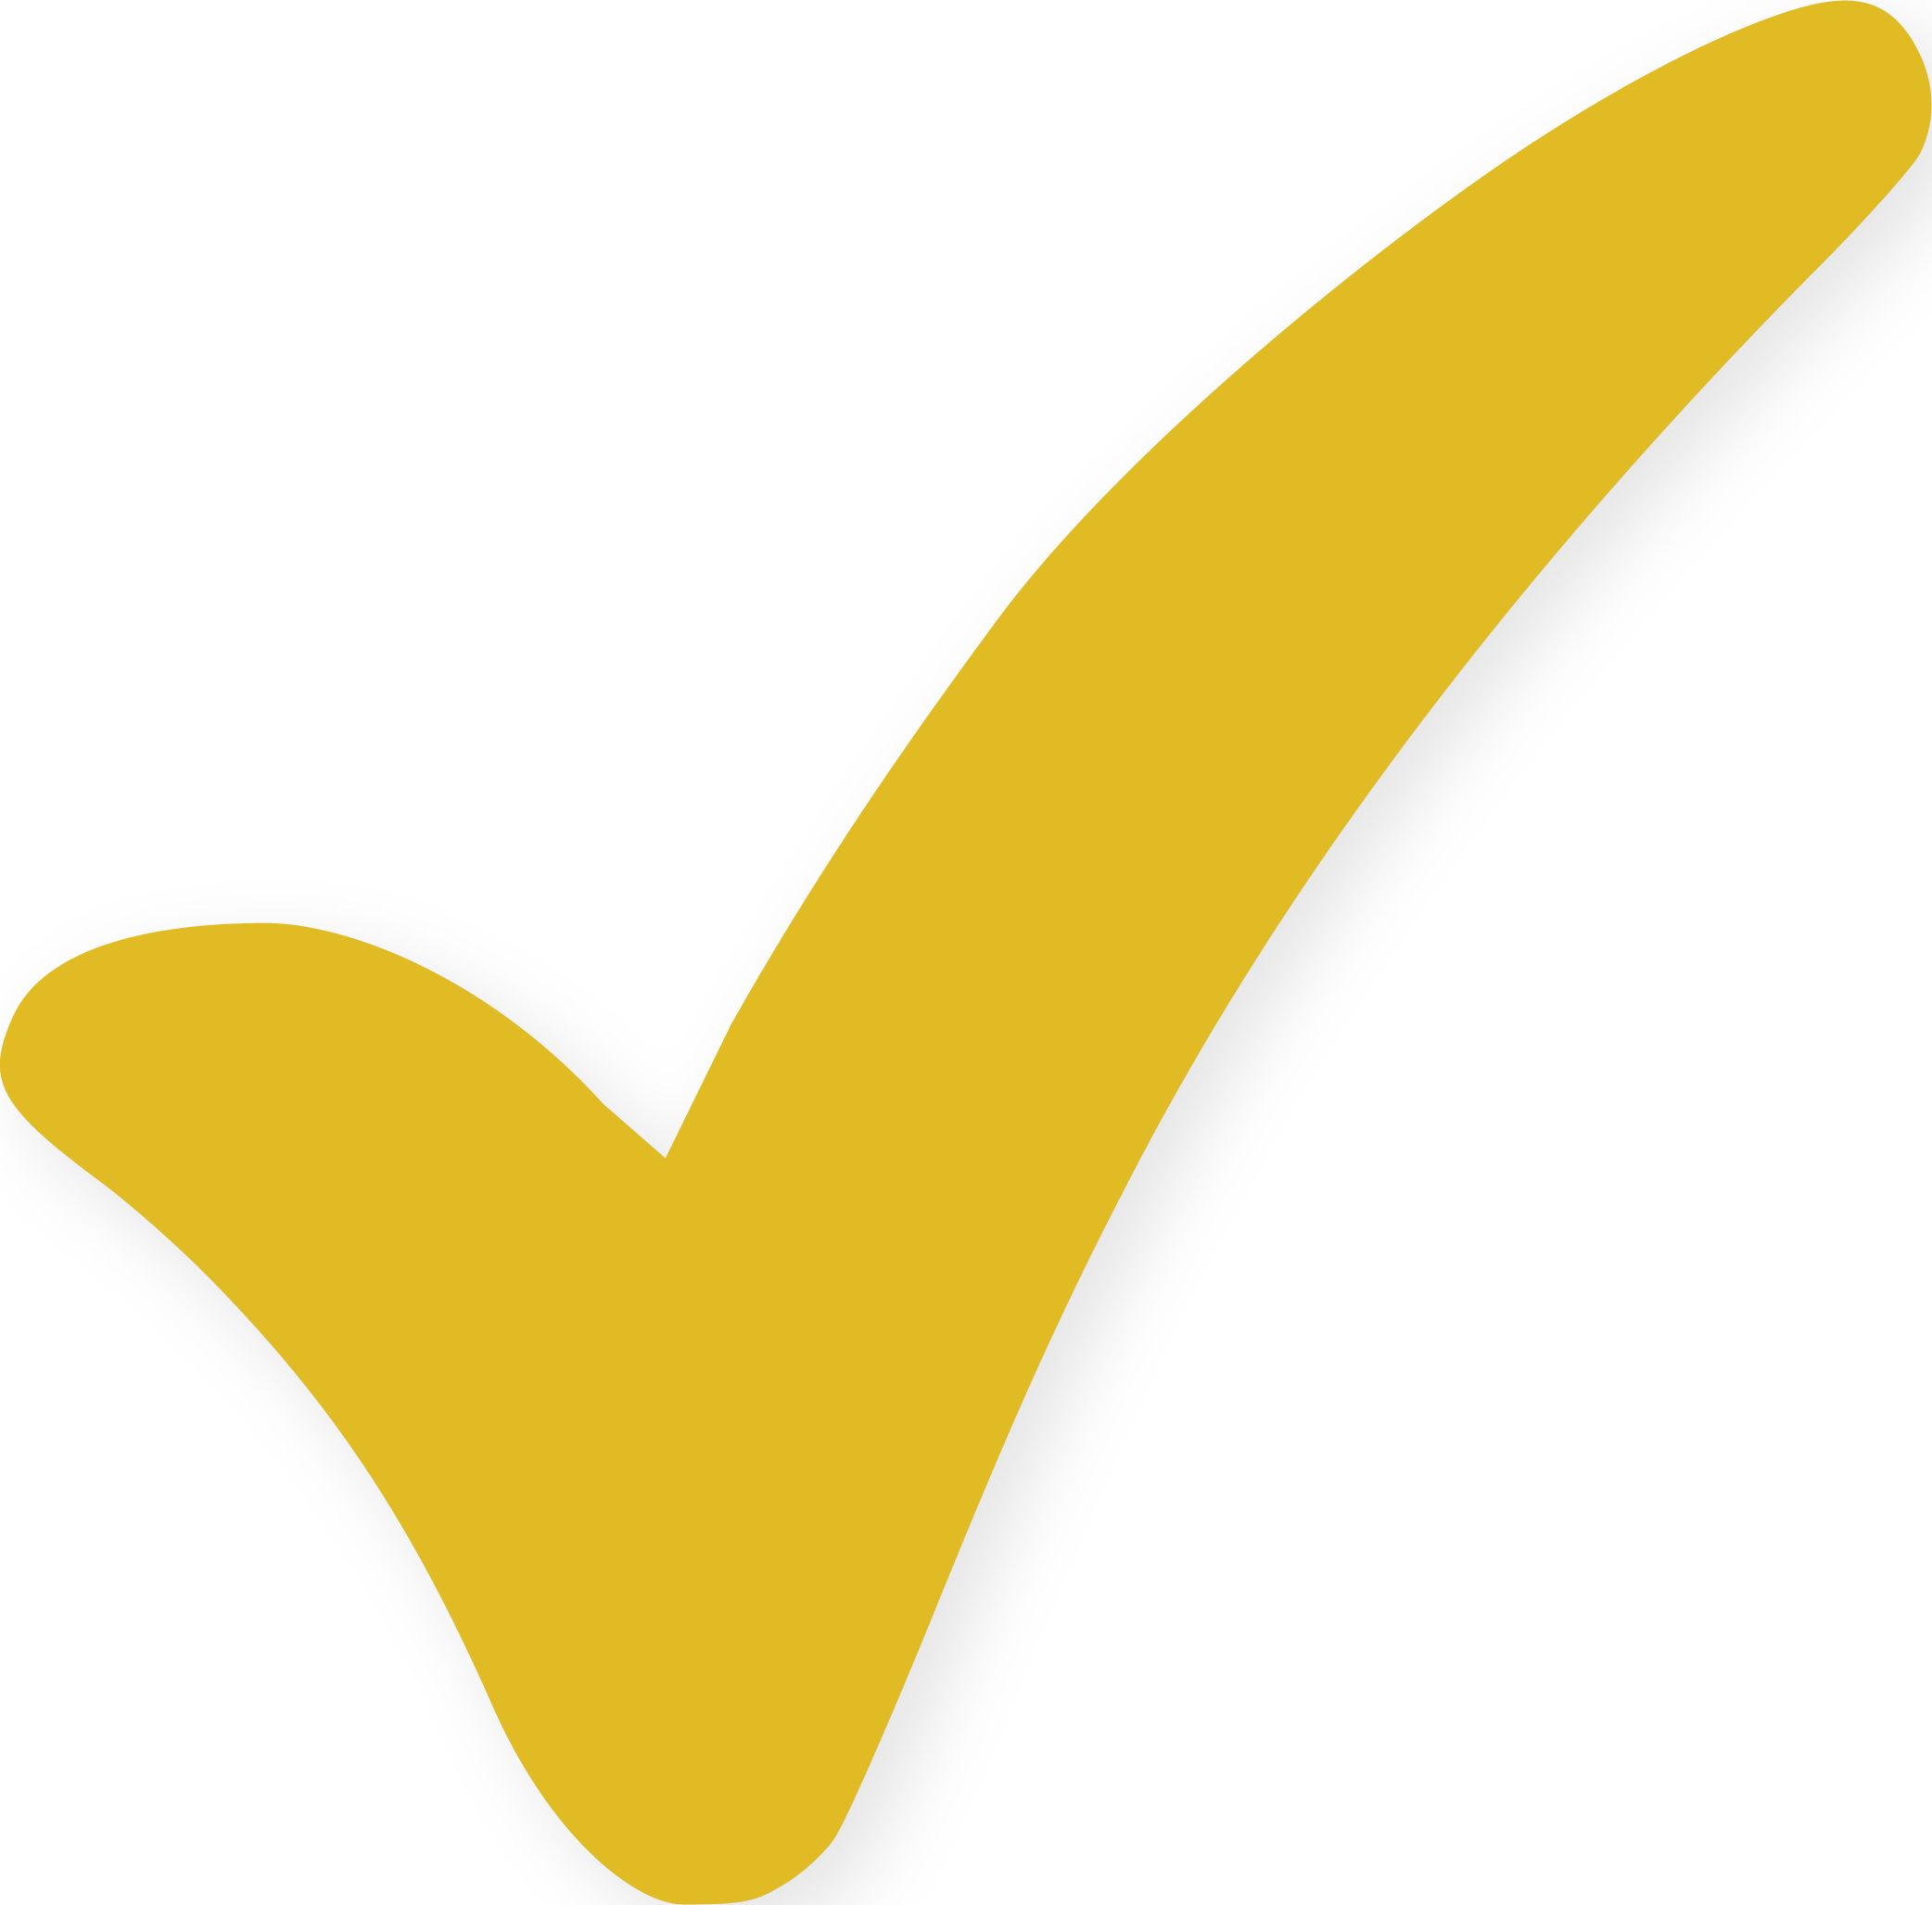 arrow_yellow